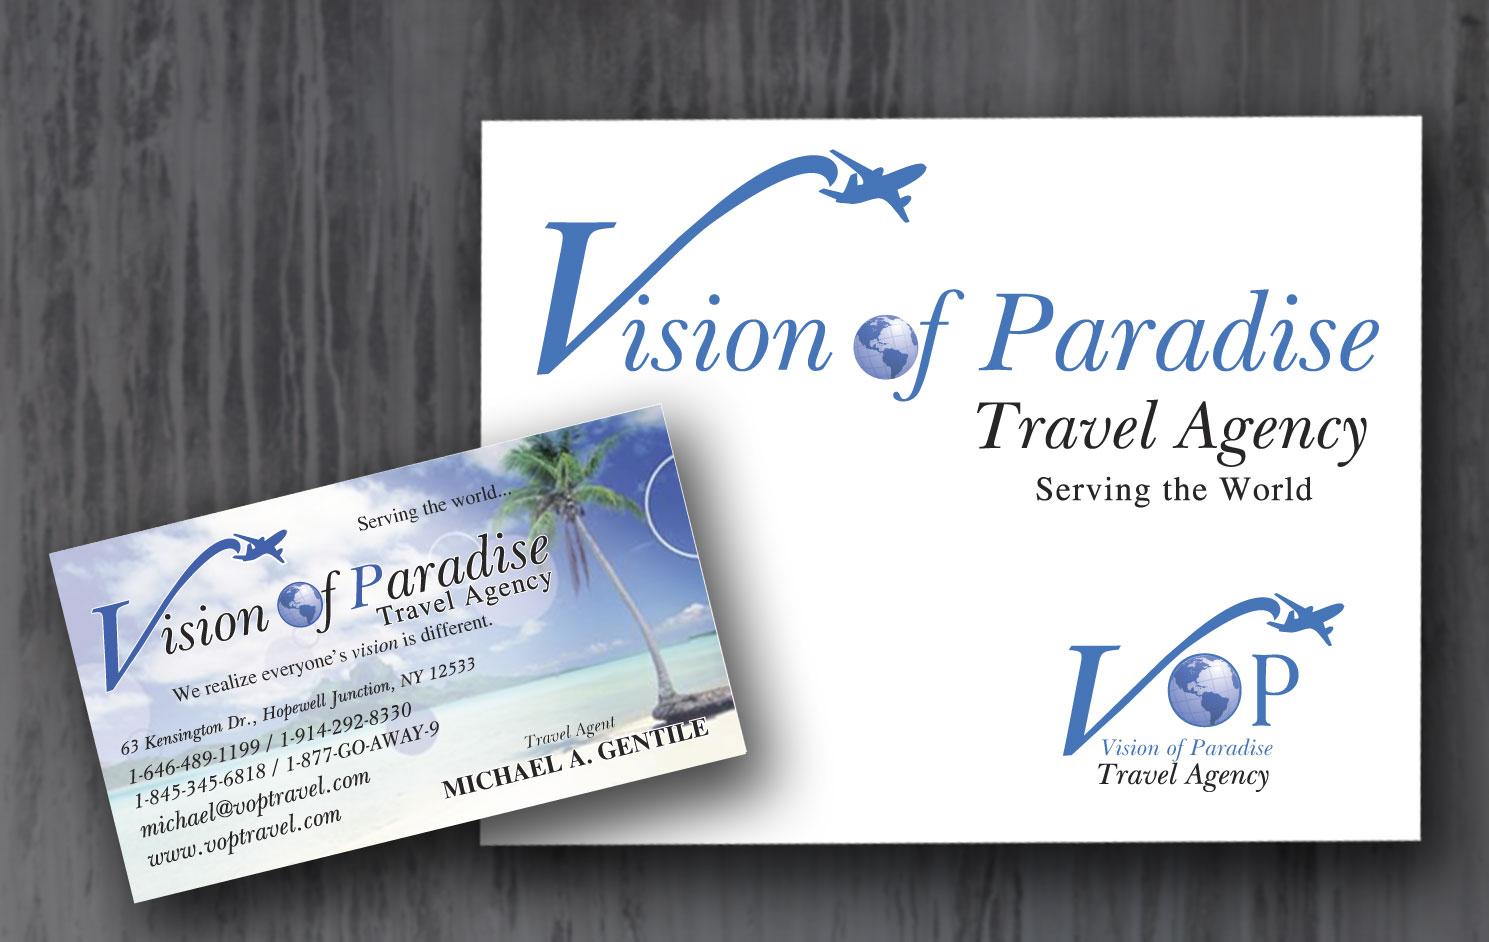 visionofparadise